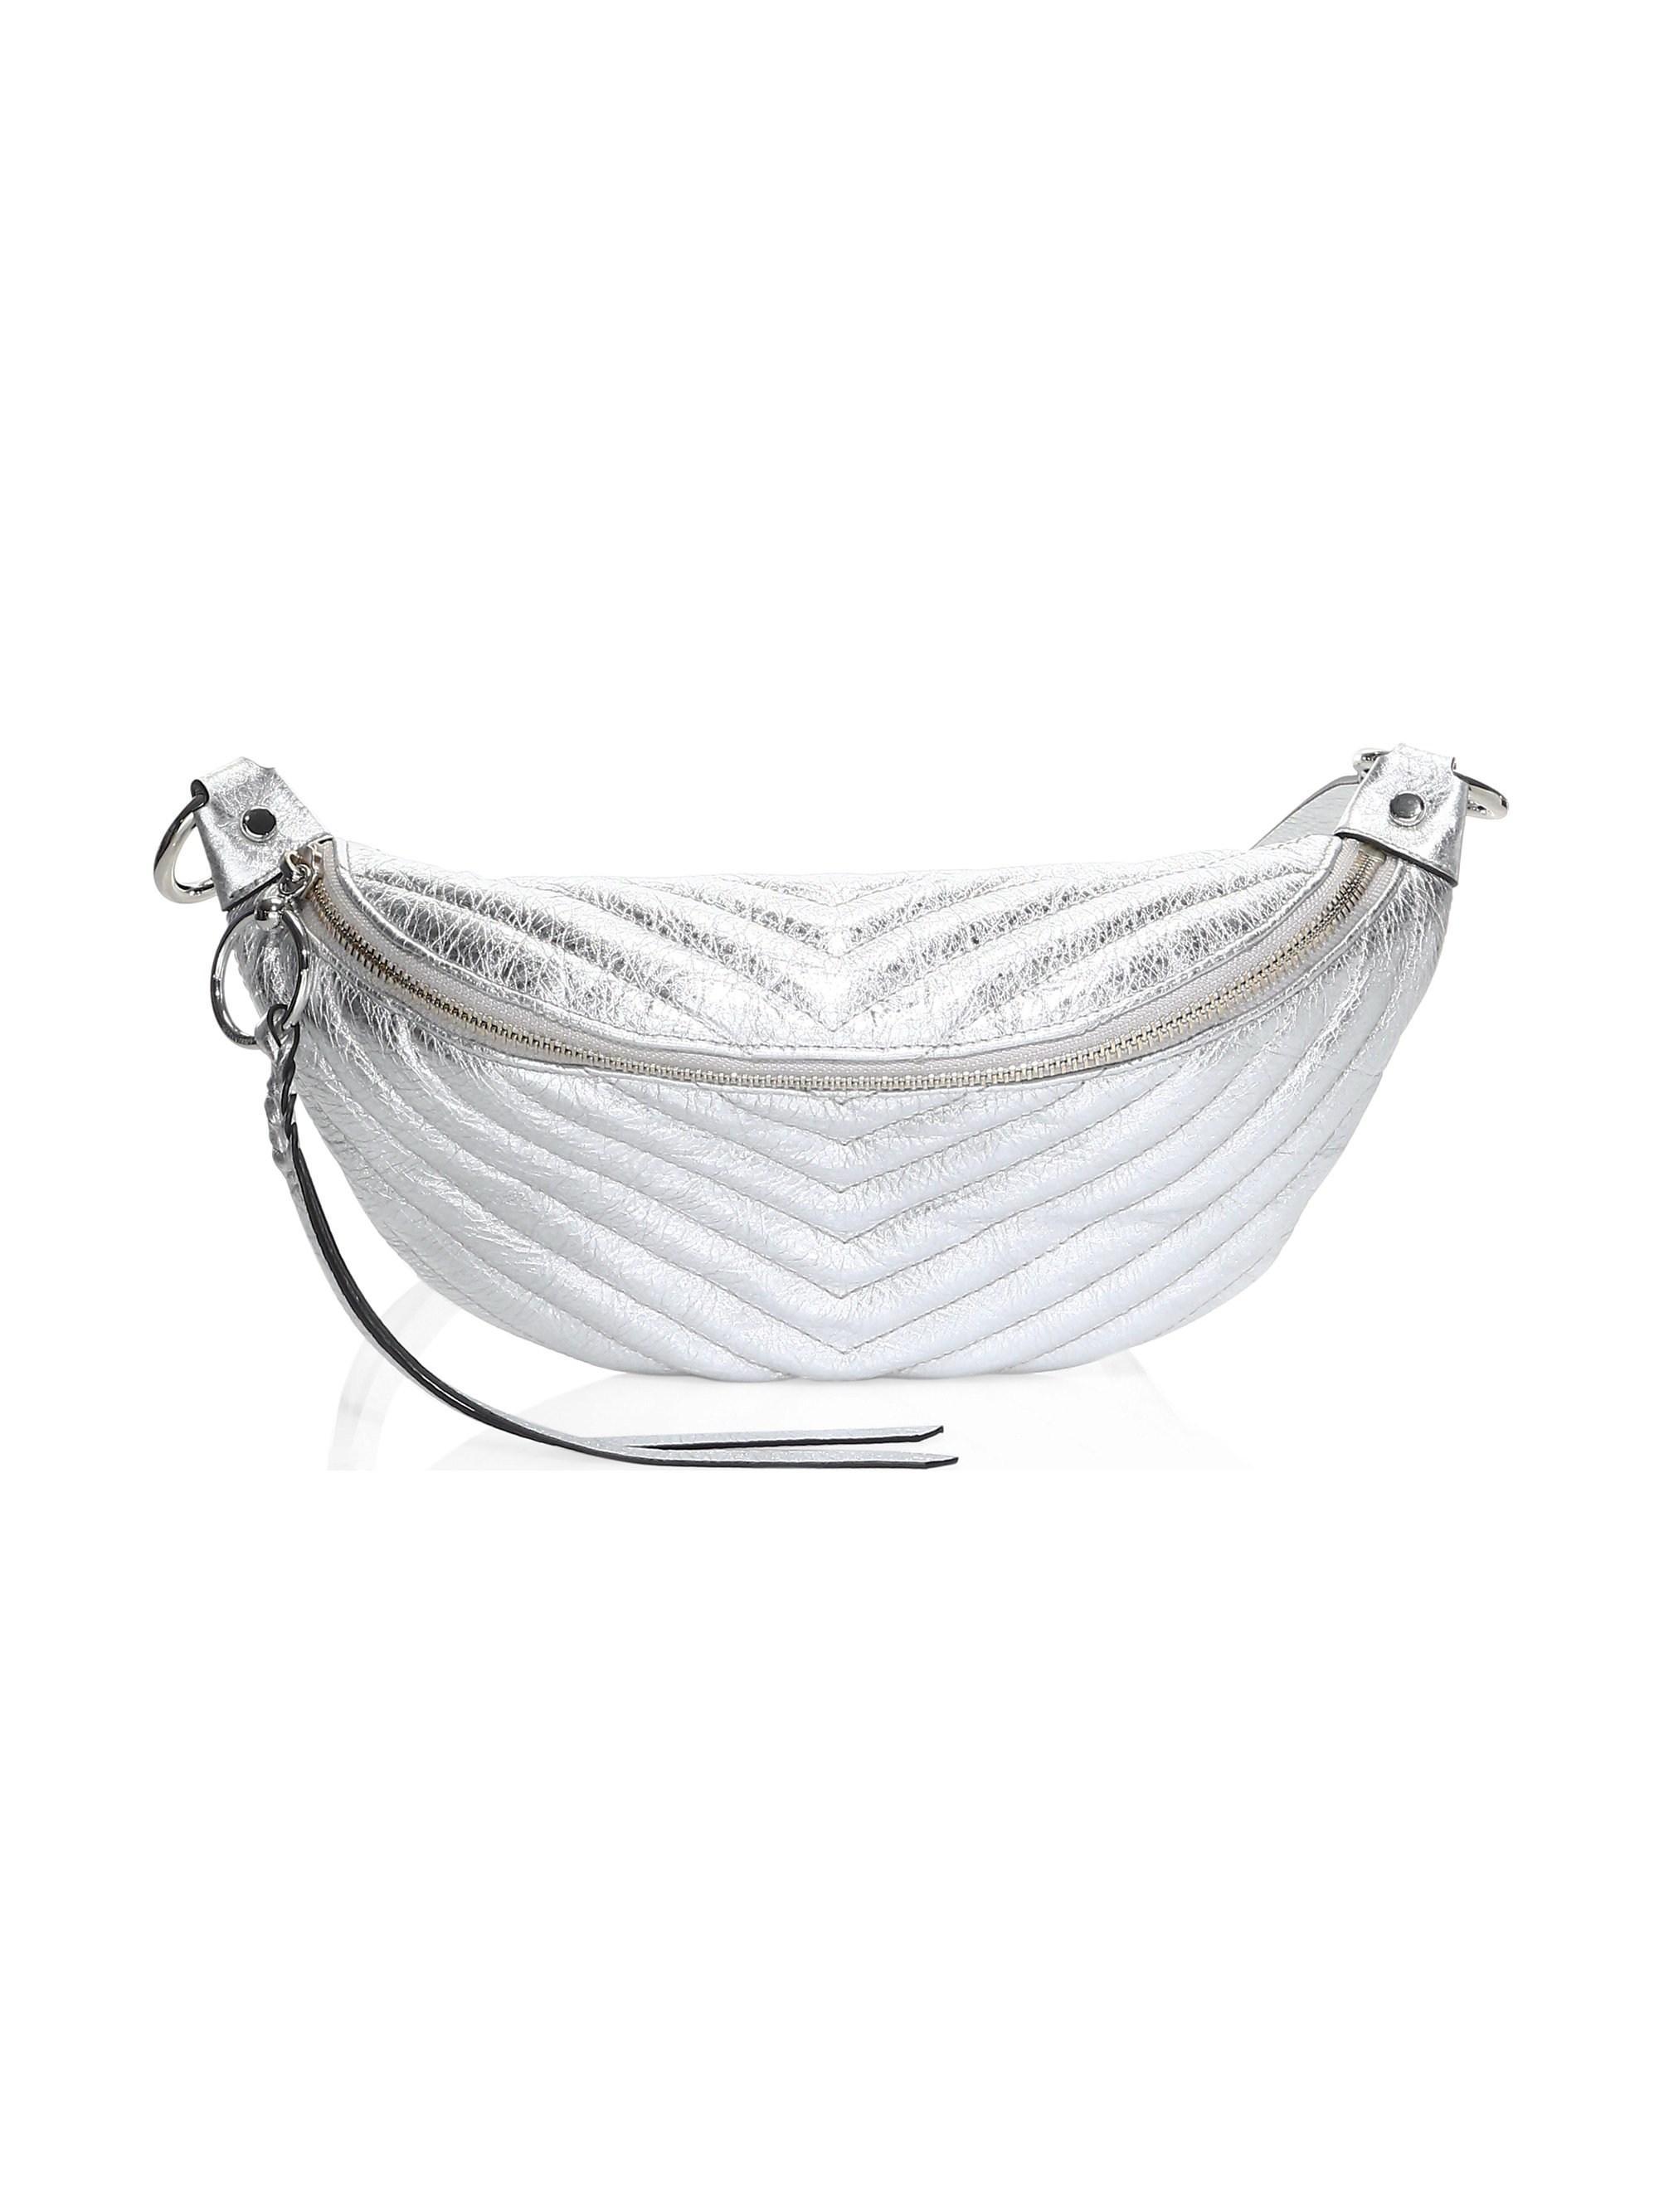 e2cbd45b7 Rebecca Minkoff. Women s Edie Quilted Leather Metallic Sling Bag ...